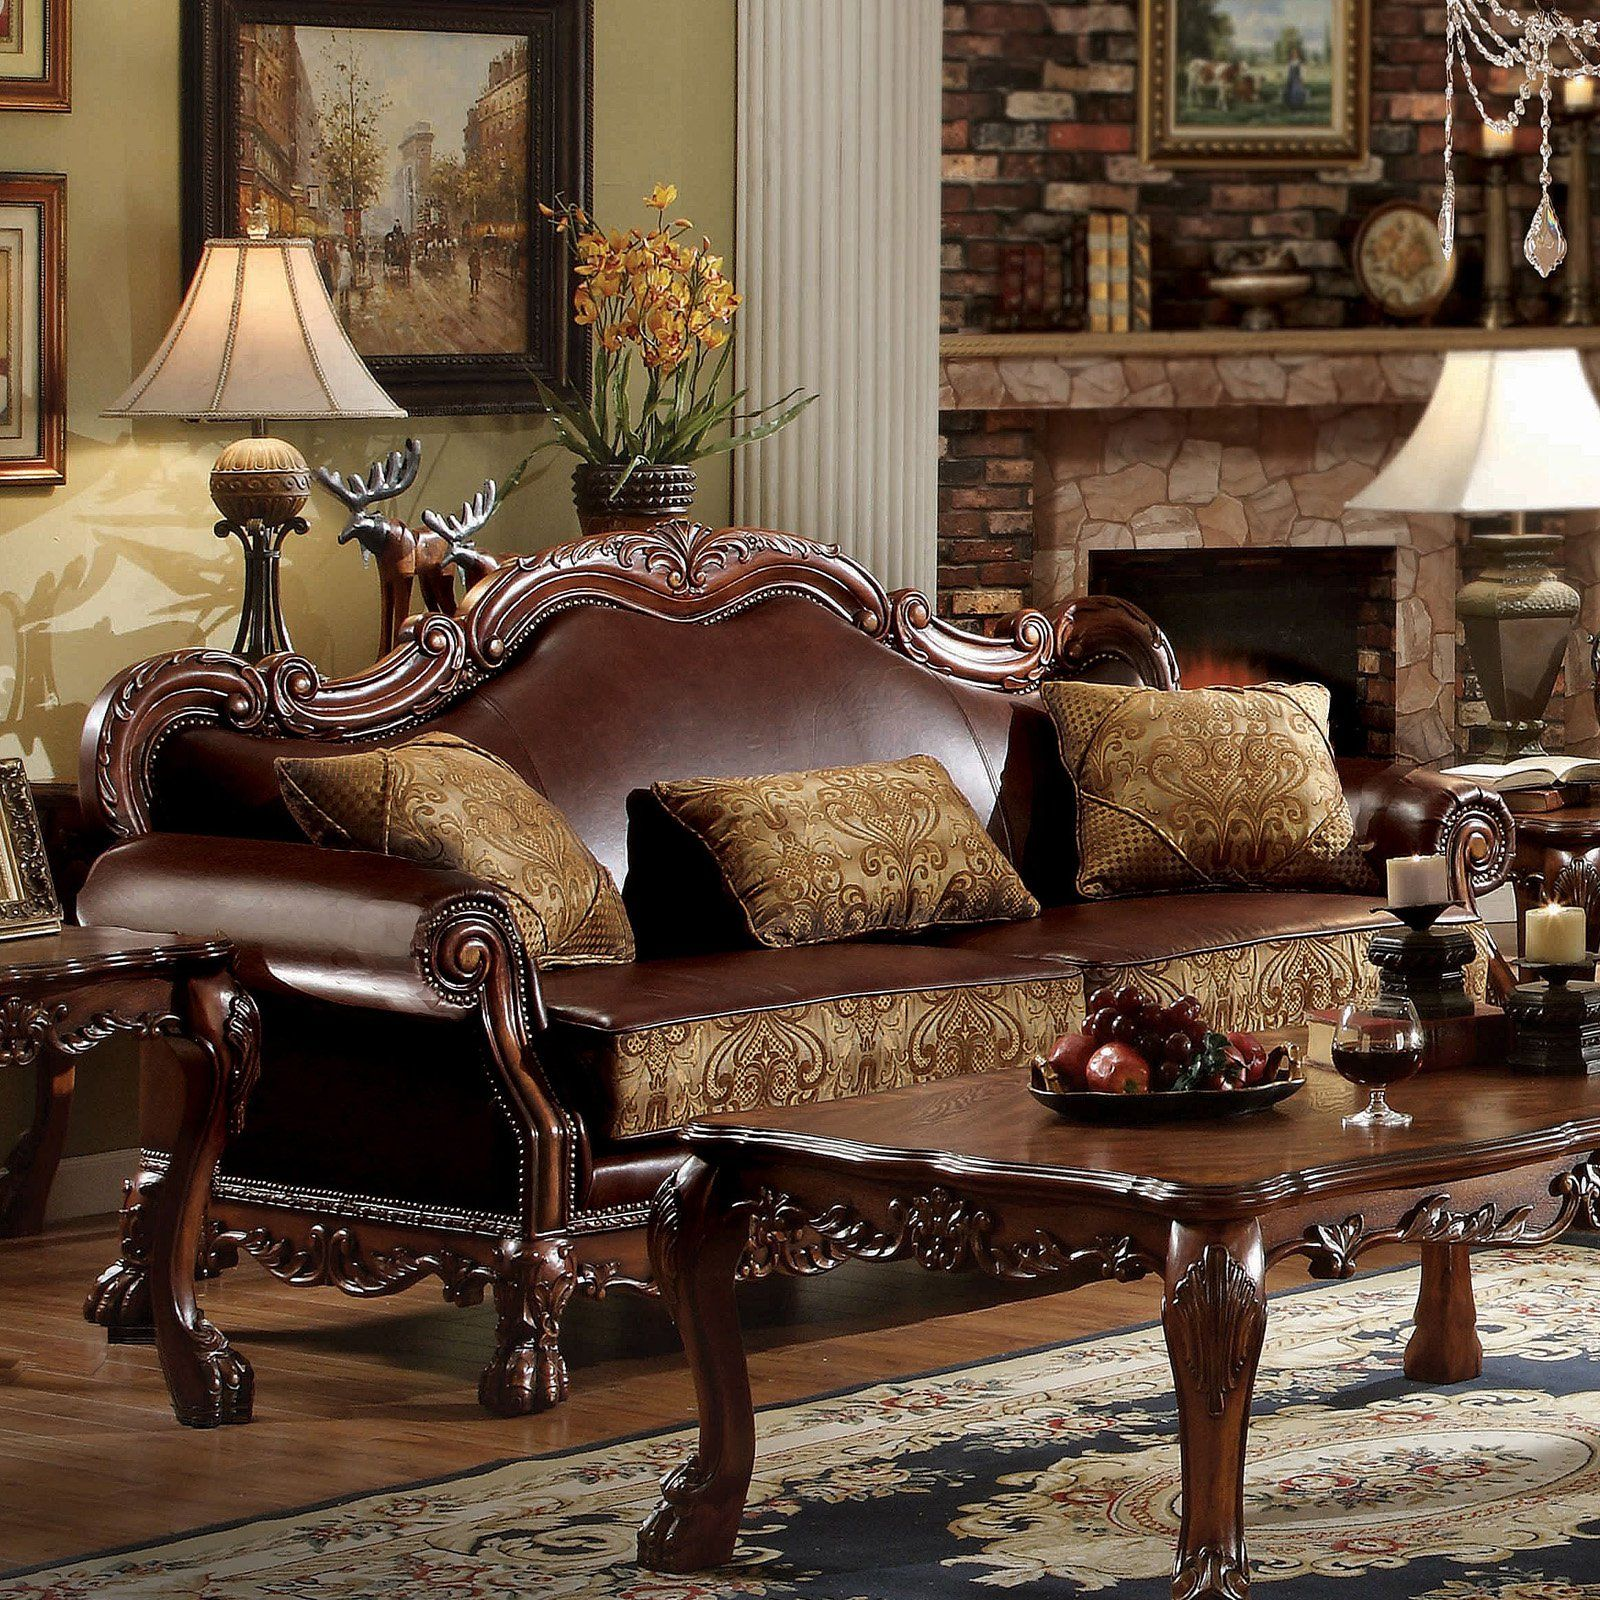 Pleasant Acme Furniture Dresden Sofa With 3 Pillows In 2019 Machost Co Dining Chair Design Ideas Machostcouk